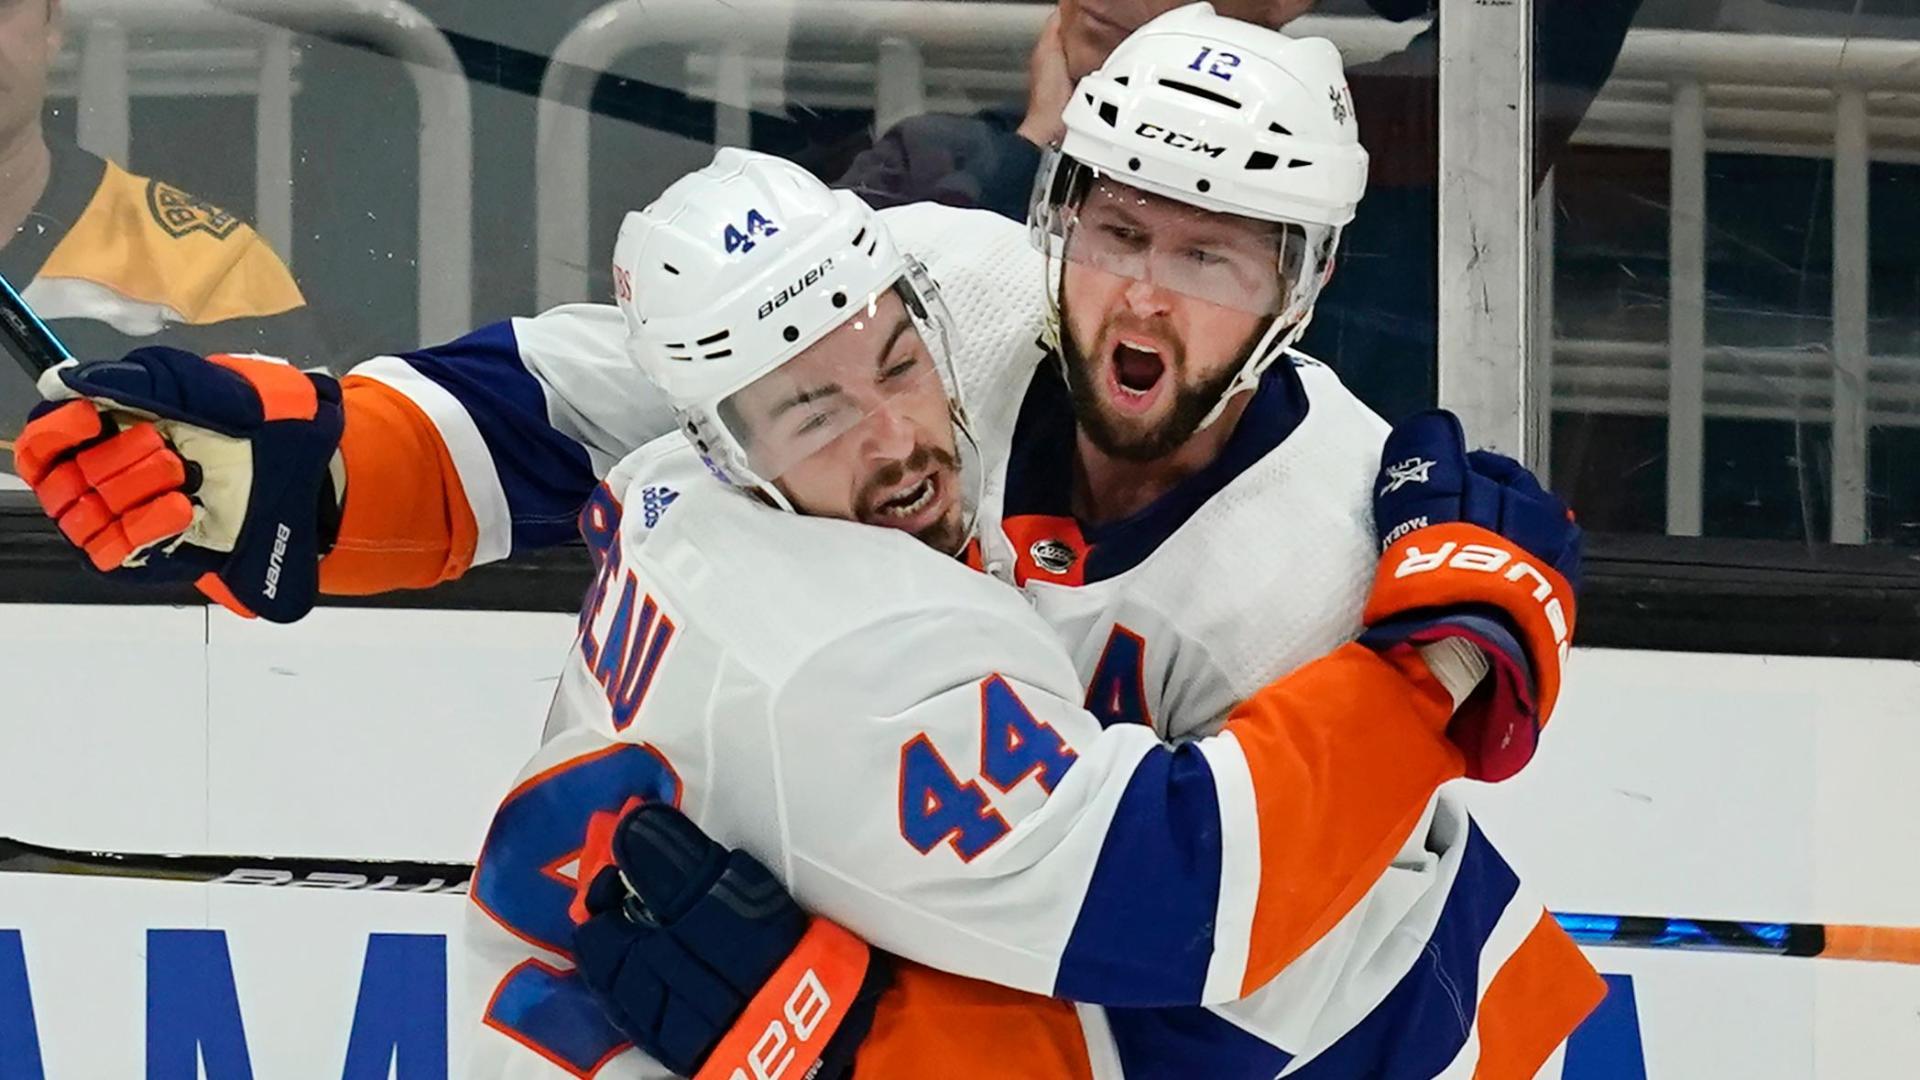 Islanders win pivotal Game 5 behind Josh Bailey's go-ahead goal